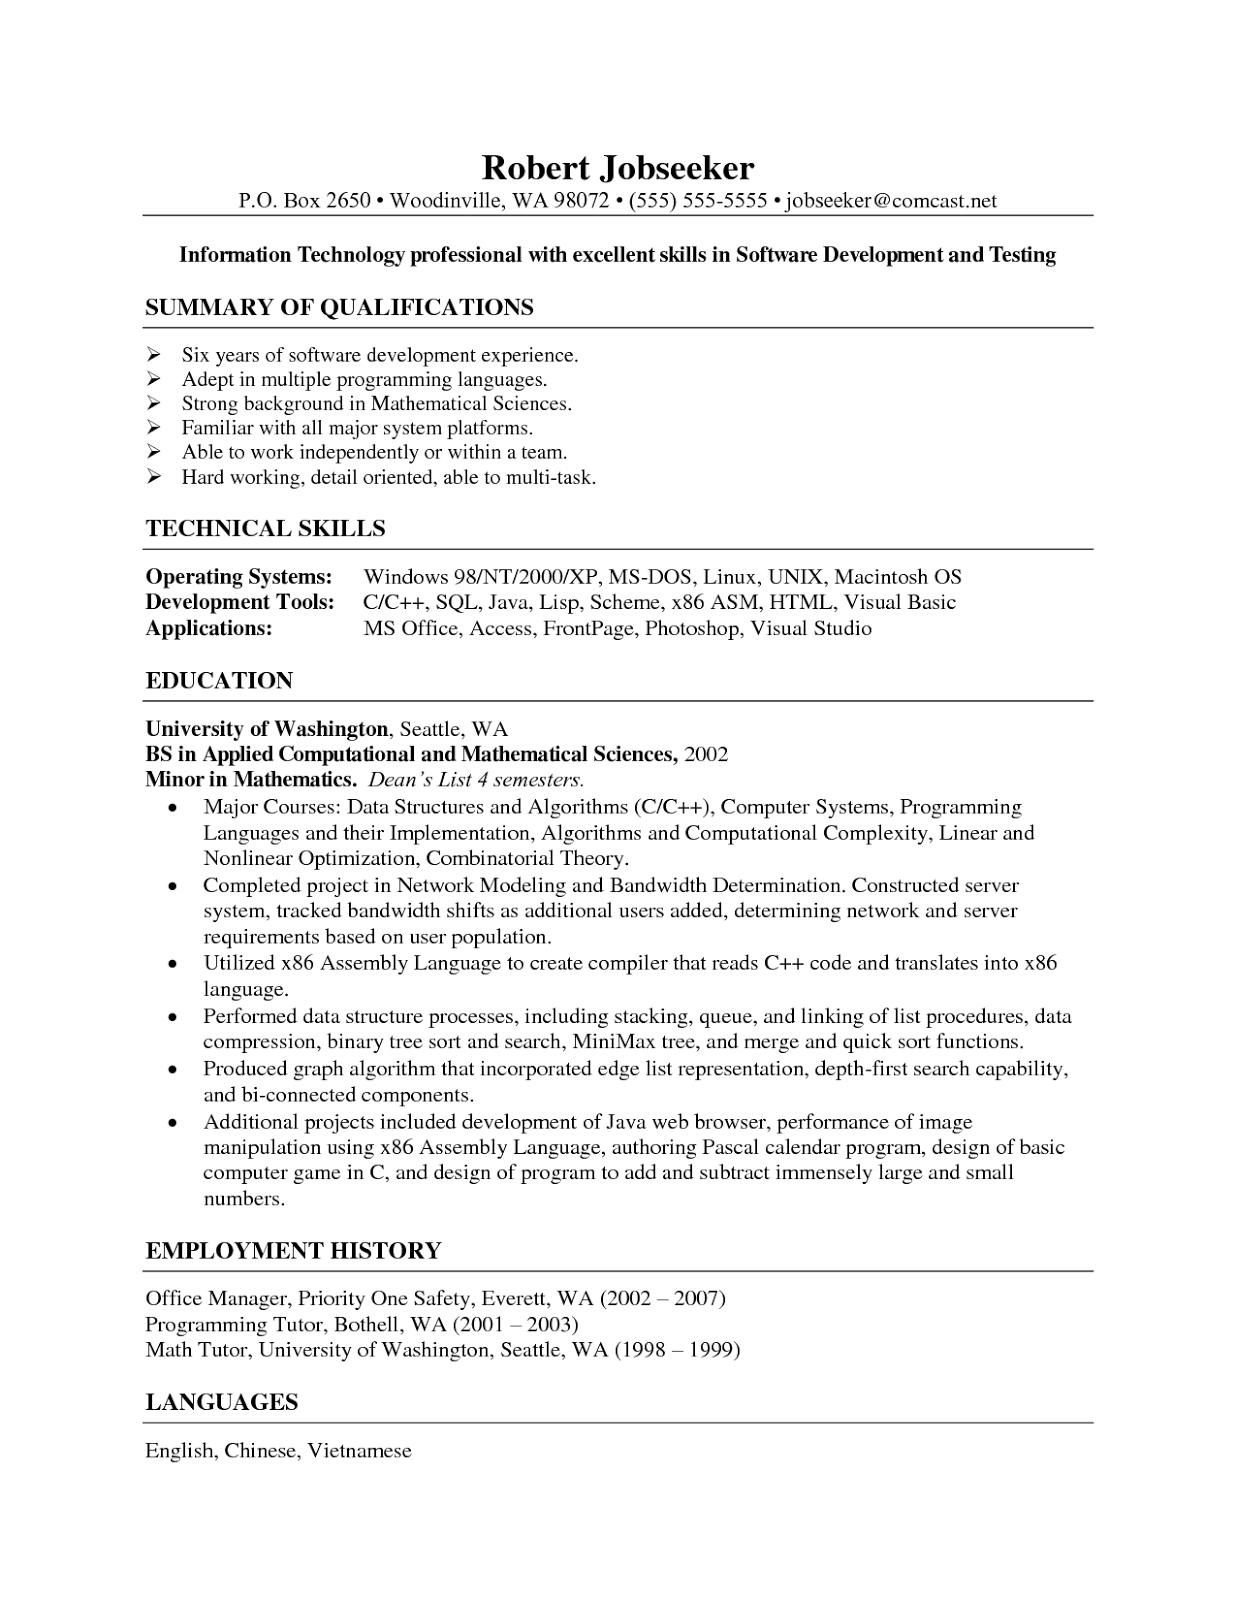 Job Application Letter Quality Assurance